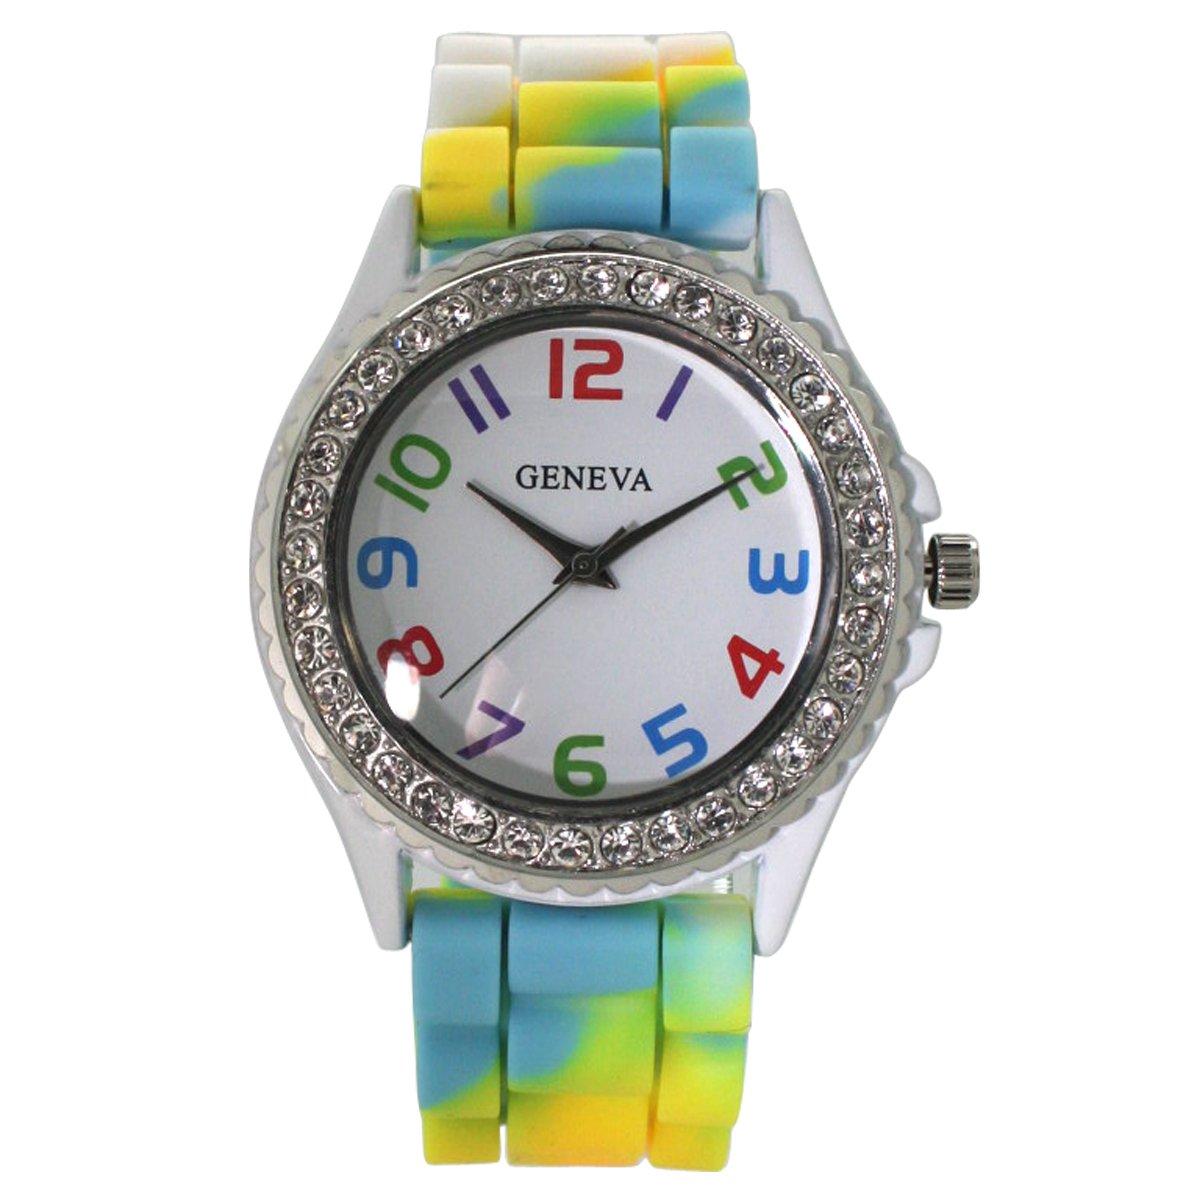 Large Face Silicone Strap Band Watch withラインストーン ホワイト B07BRZS213 ホワイト ホワイト